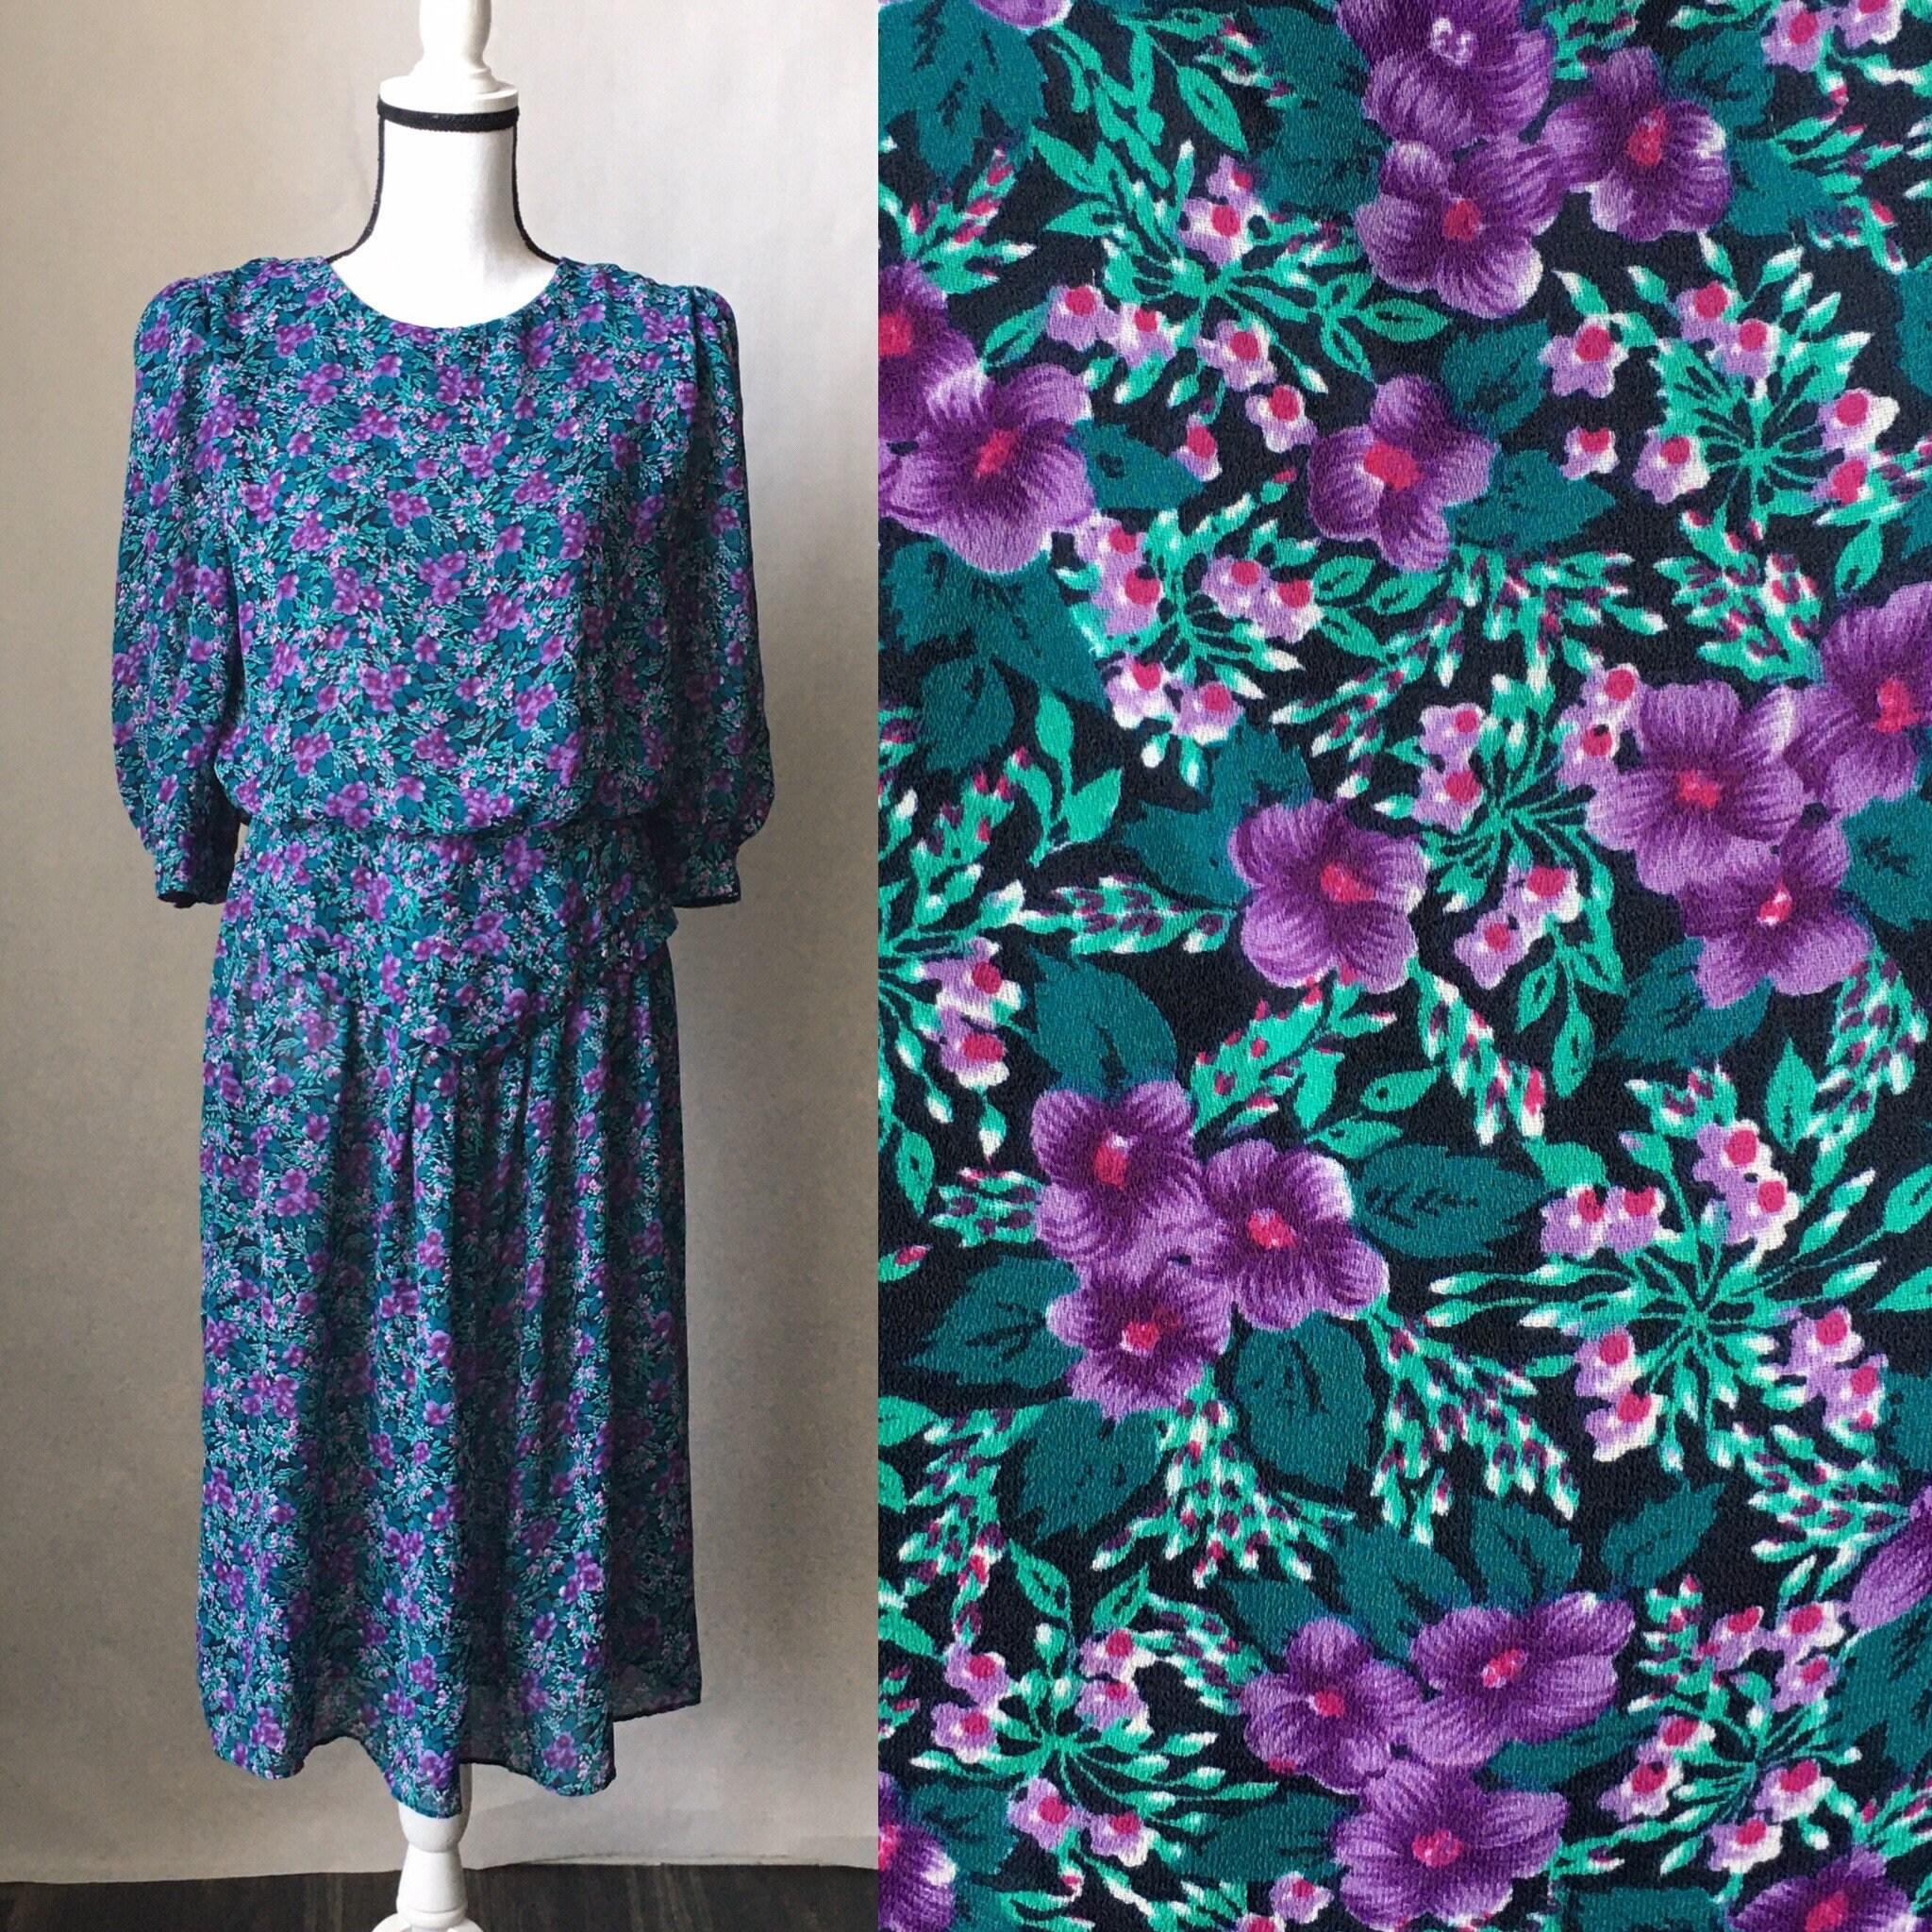 80s Dresses | Casual to Party Dresses Vintage Caroline Wells Collection, 1980S Long Sleeve Floral Dress, 1980S Blouson Style Dress, Vintage Purple Dress $25.00 AT vintagedancer.com